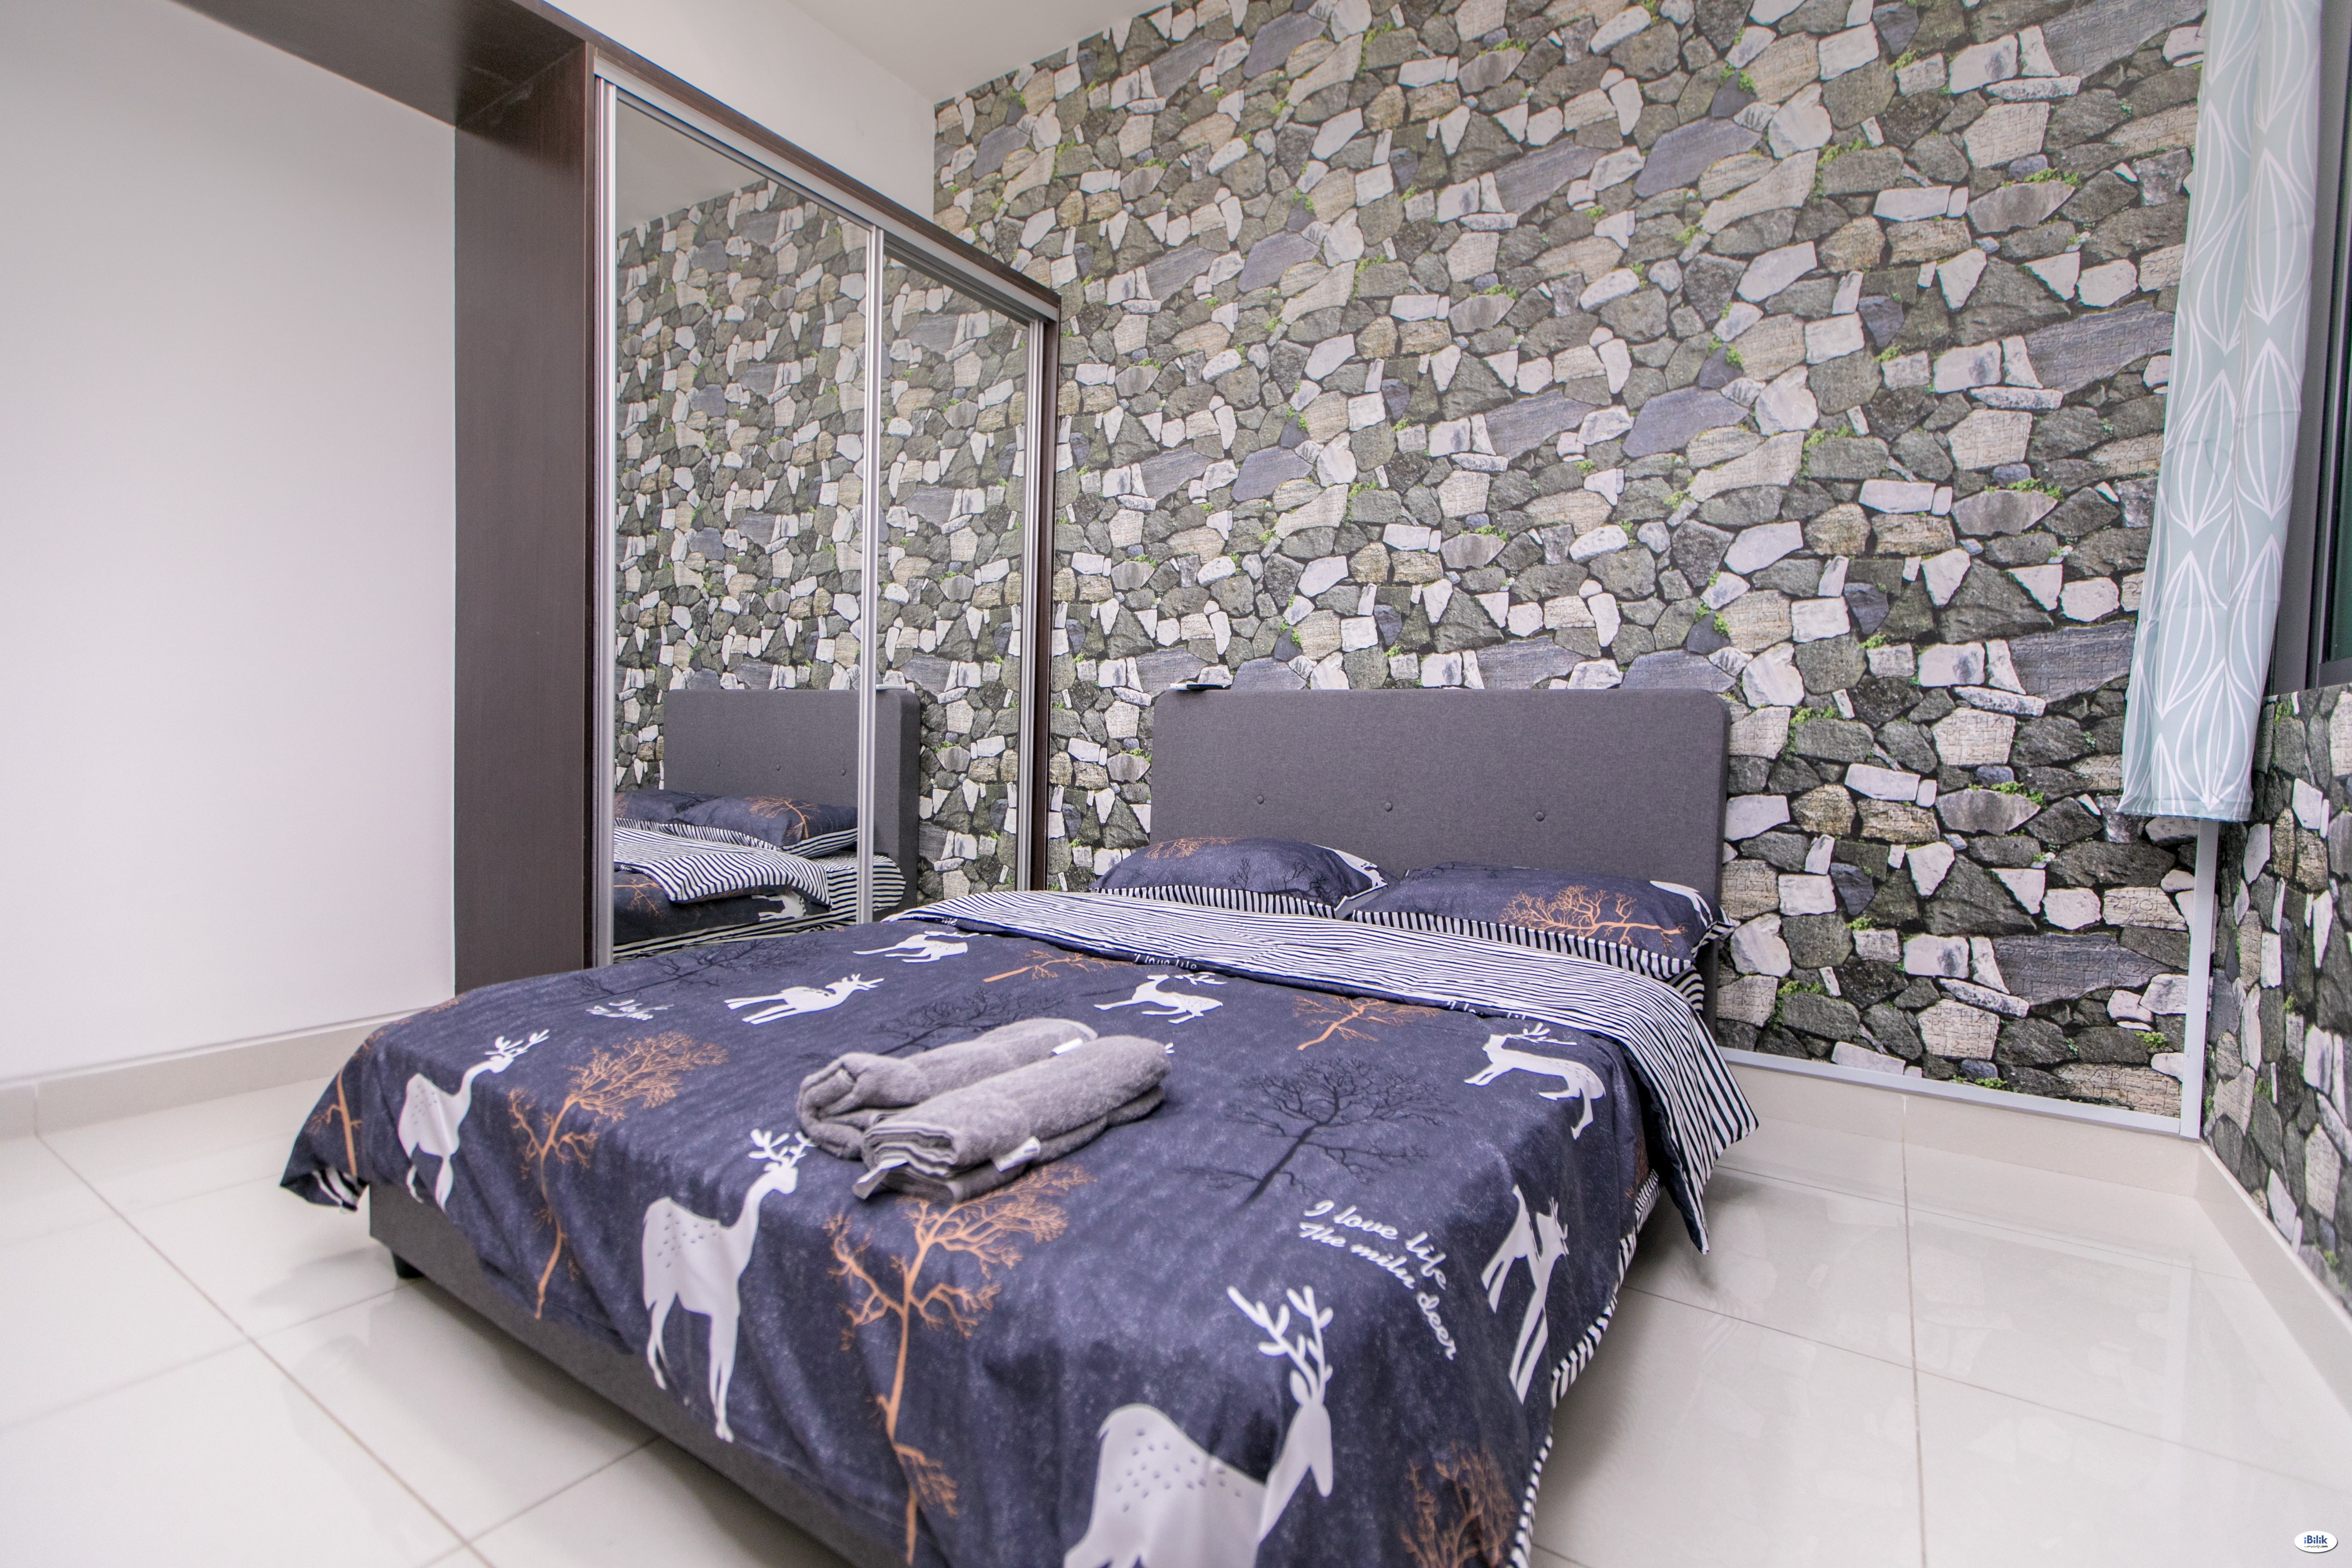 Vacation Apartment at Cyberjaya, Selangor